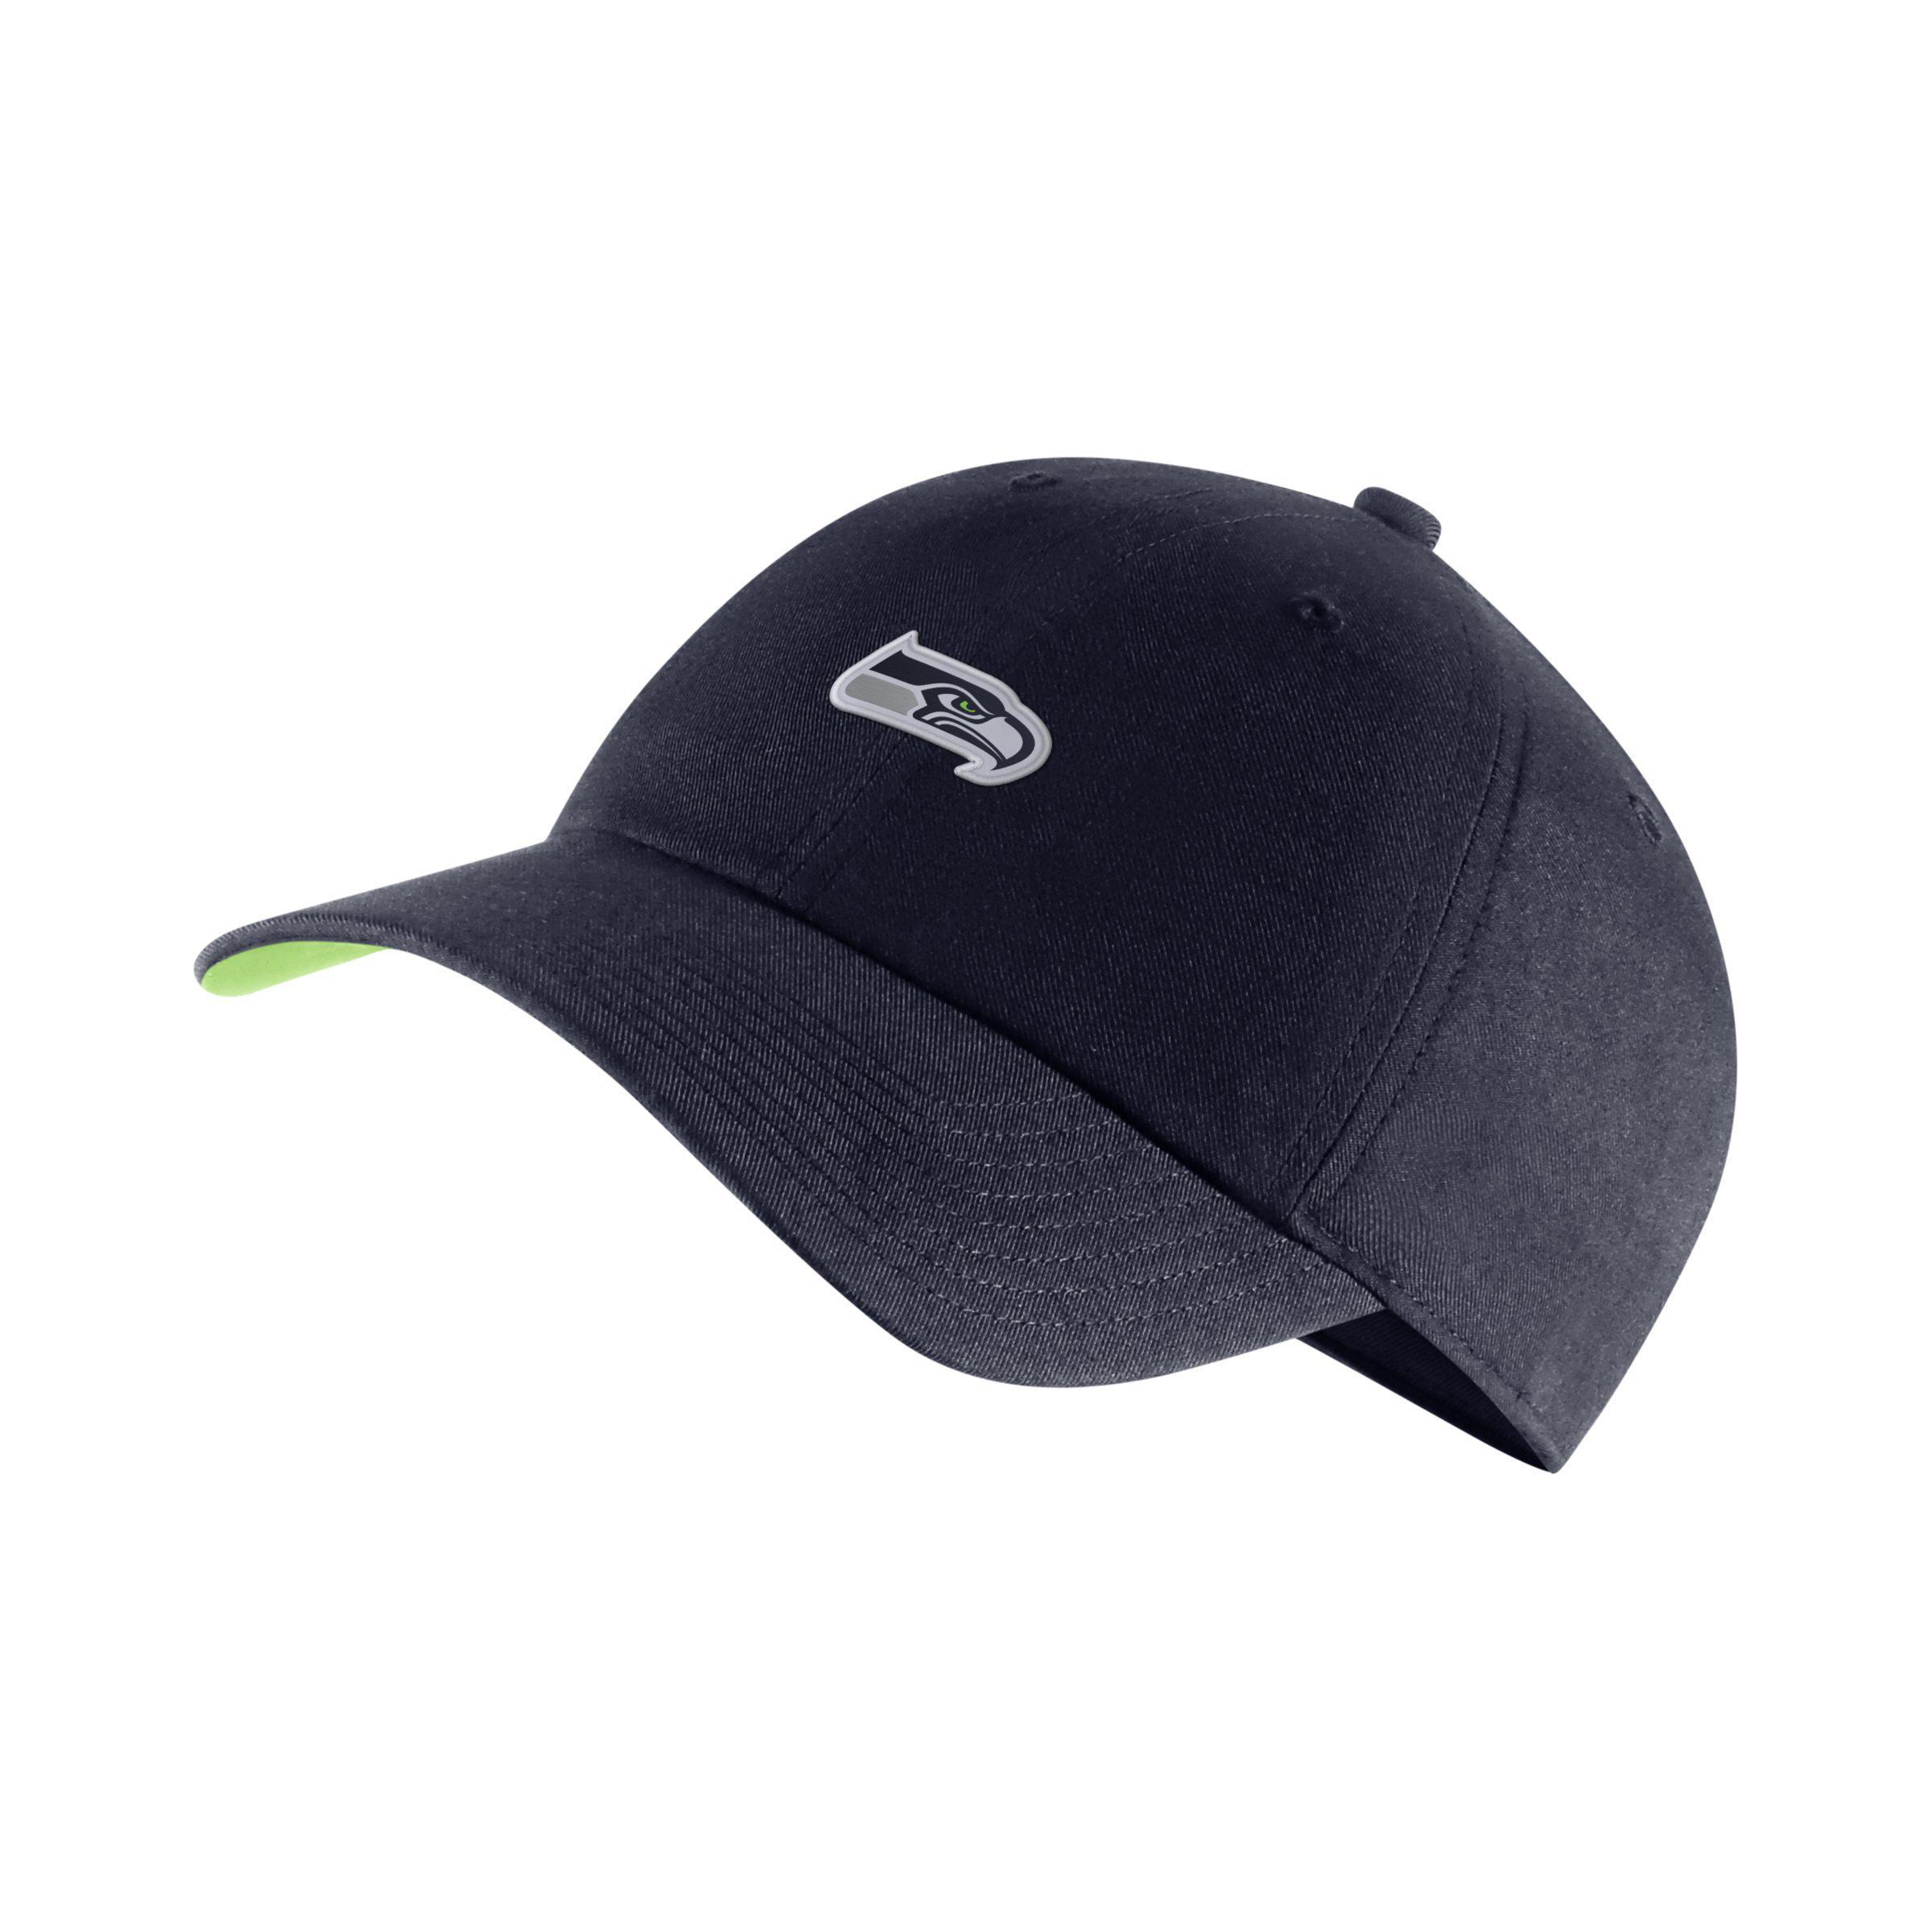 641577c64ee Nike Heritage86 (nfl Seahawks) Adjustable Hat in Blue - Lyst